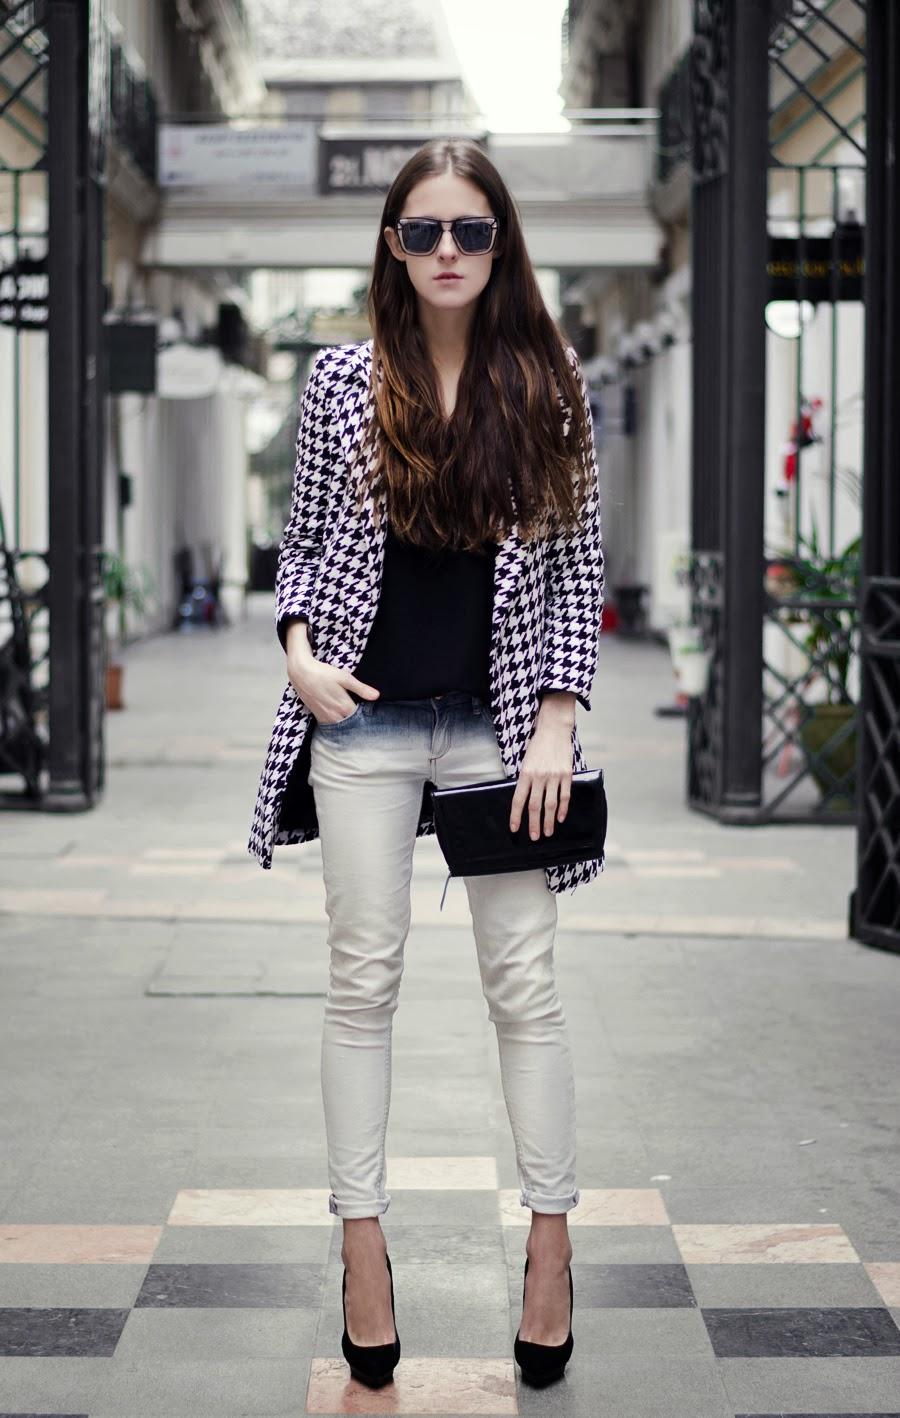 fashion blogger, street style, fashion details, neon rock blog, houndstooth coat, coat outfit, mango heels, ootd, plastic glasses, designer sunglasses